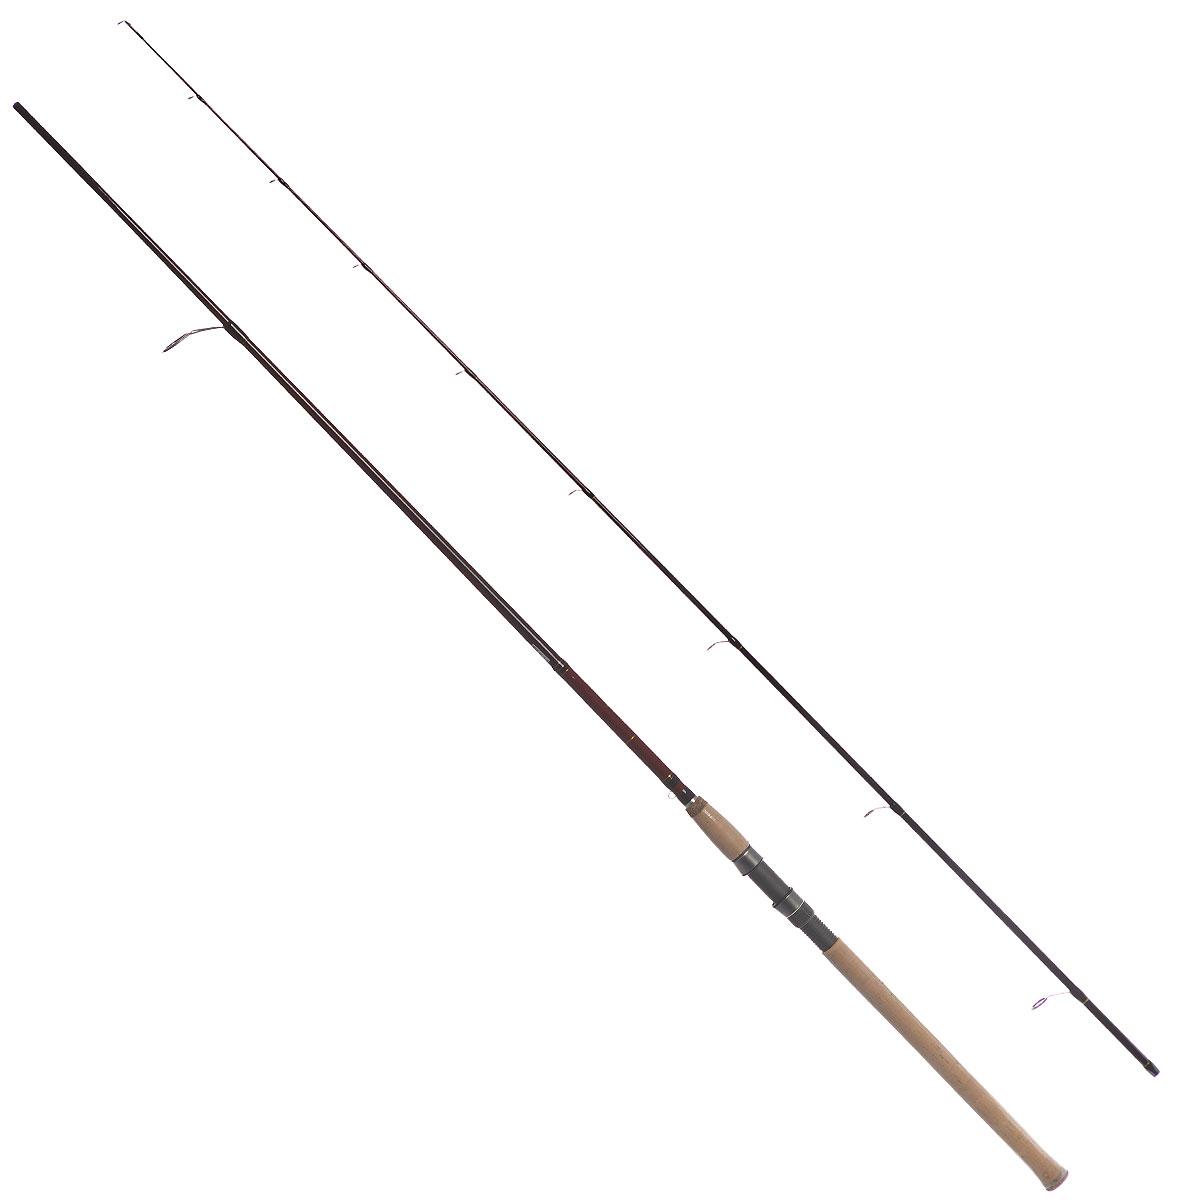 Спиннинг штекерный Daiwa Vulcan Supreme, 3 м, 15-50 г